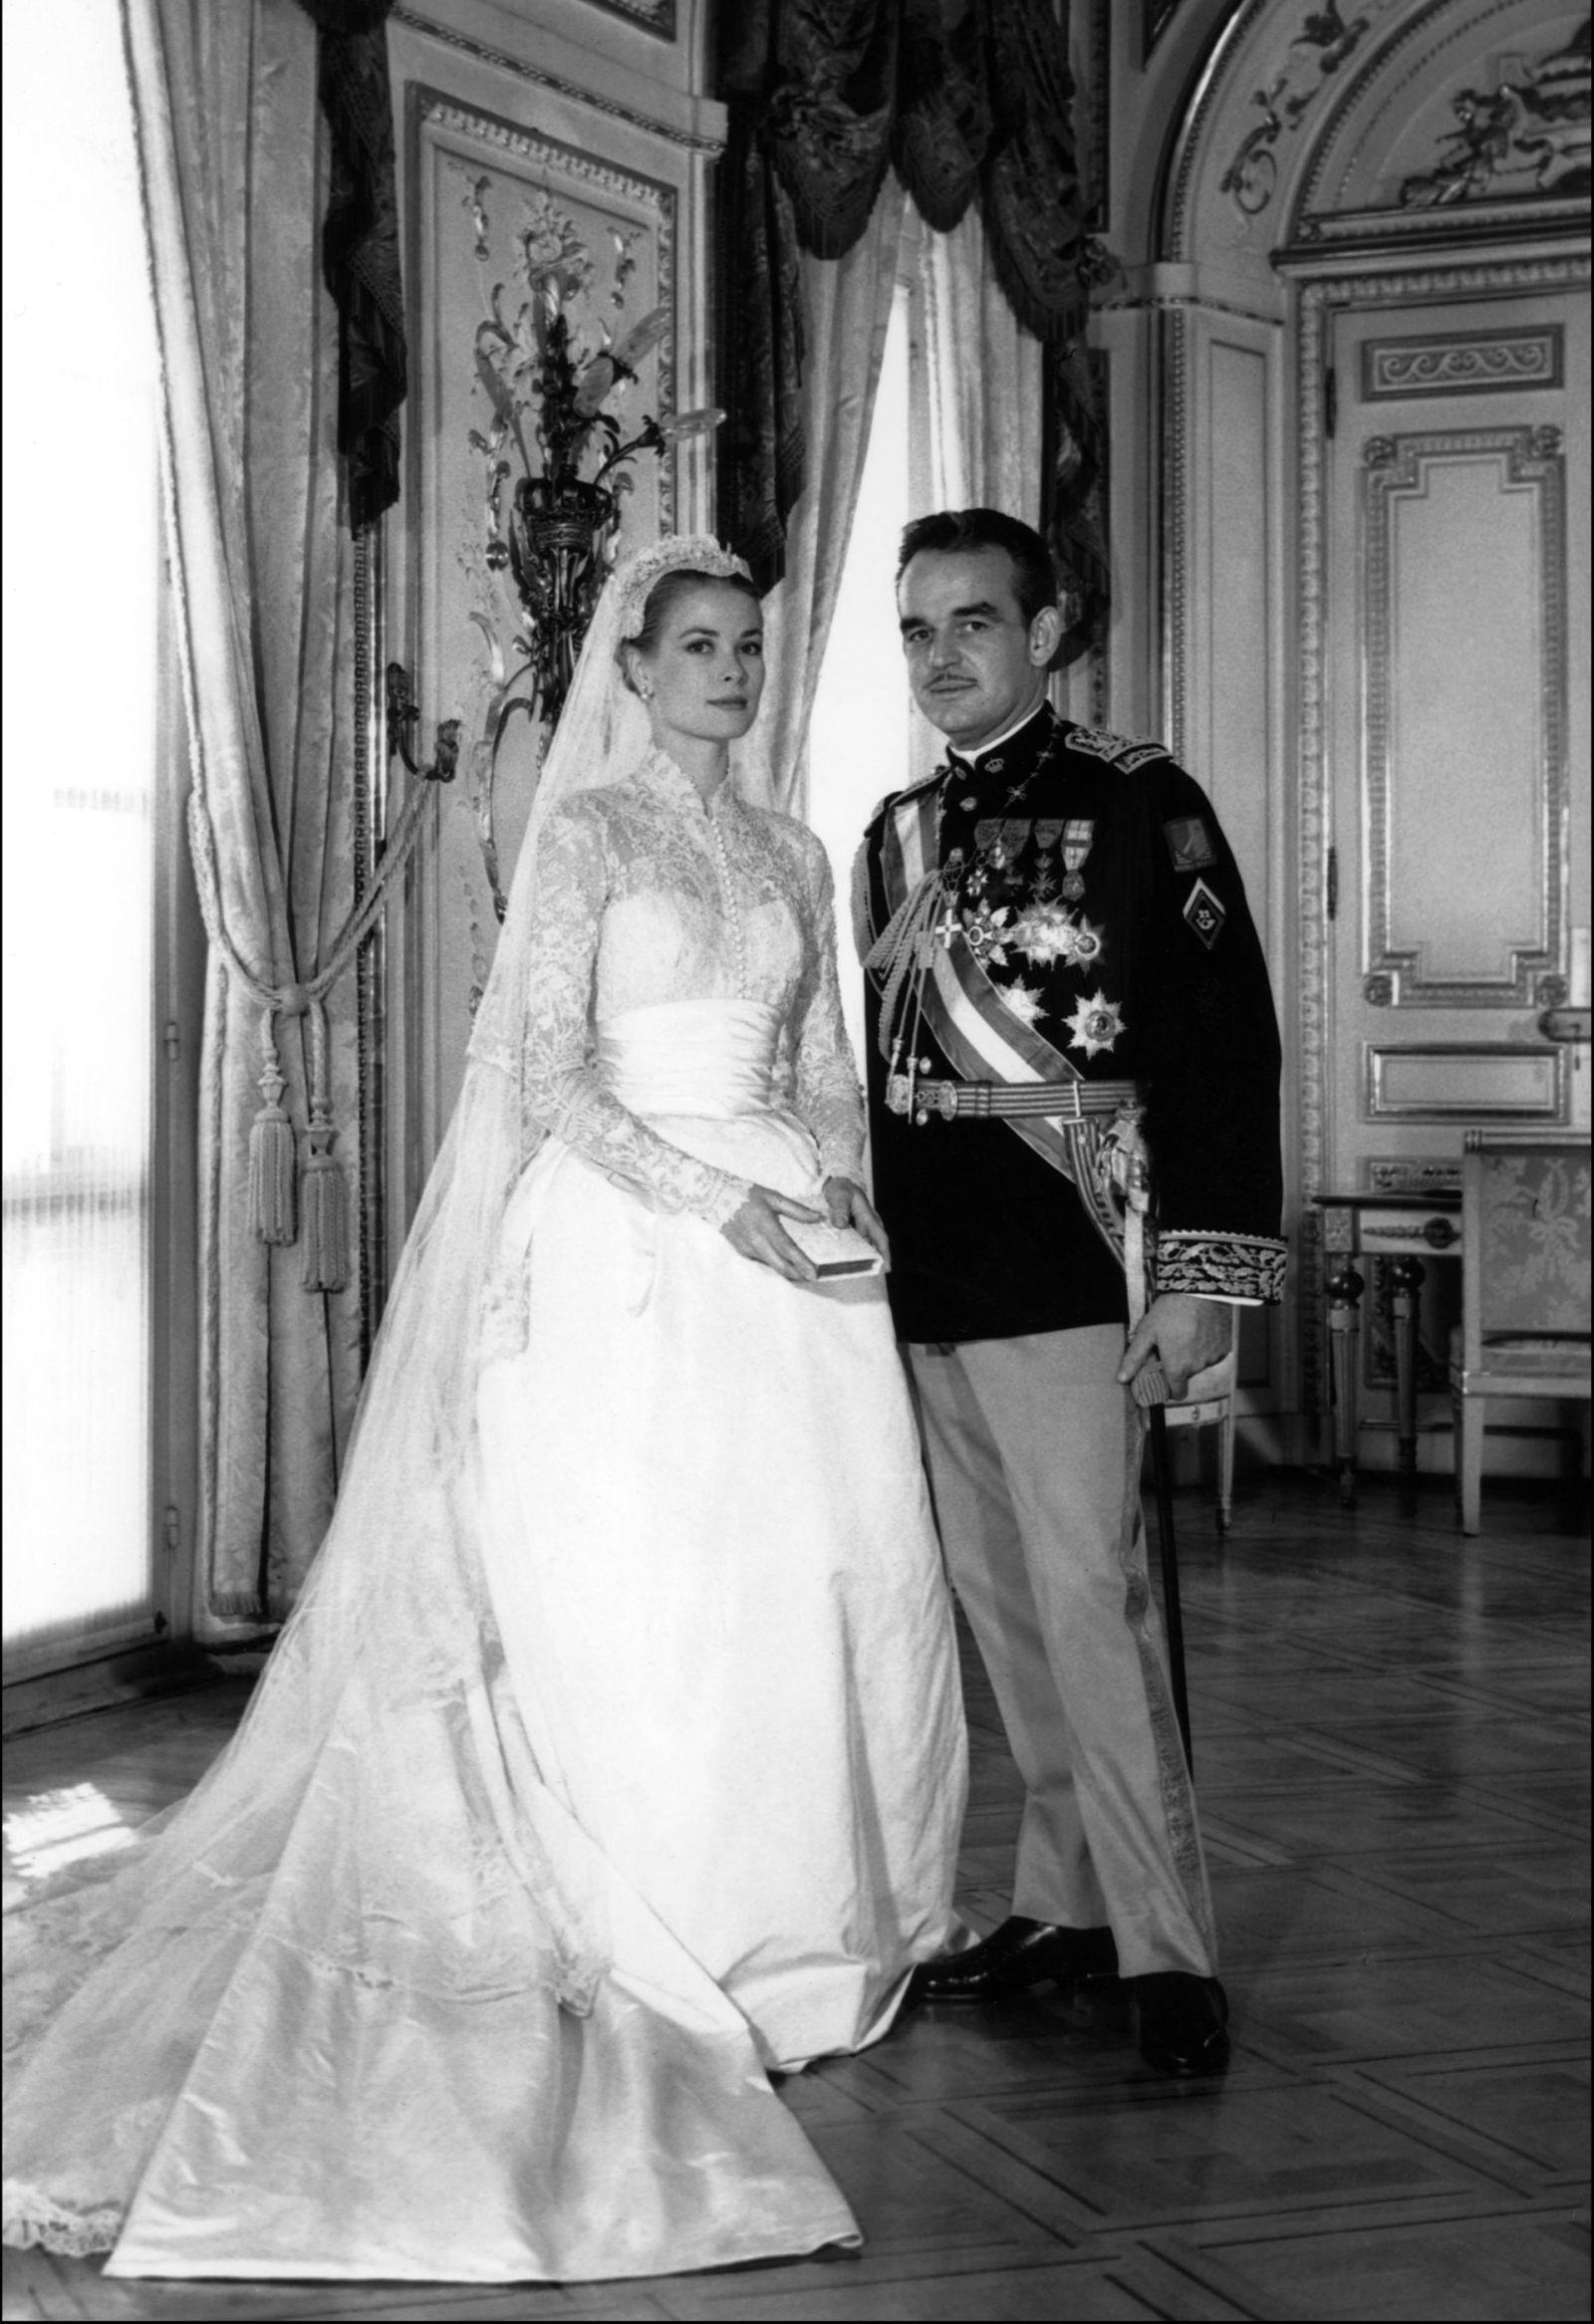 da95bde592f5 Famous Wedding Dresses - Wedding Dresses Through the Years